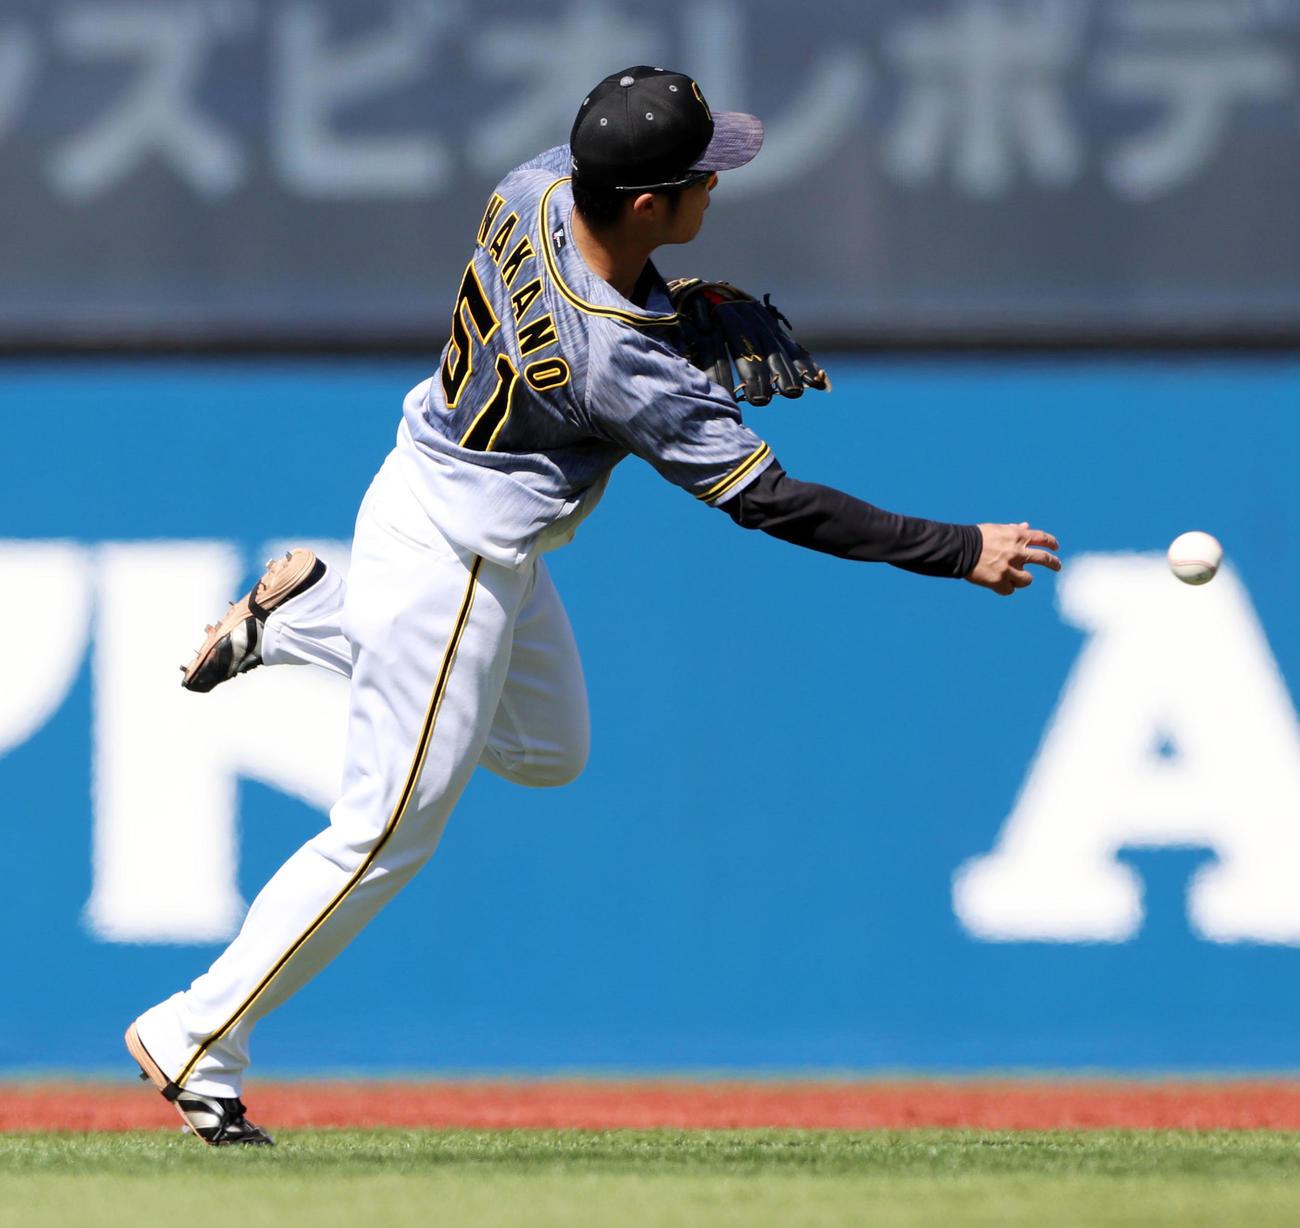 DeNA対阪神 1回裏DeNA無死、プロ初先発の中野は関根の打球を一塁へ送球する(撮影・加藤哉)